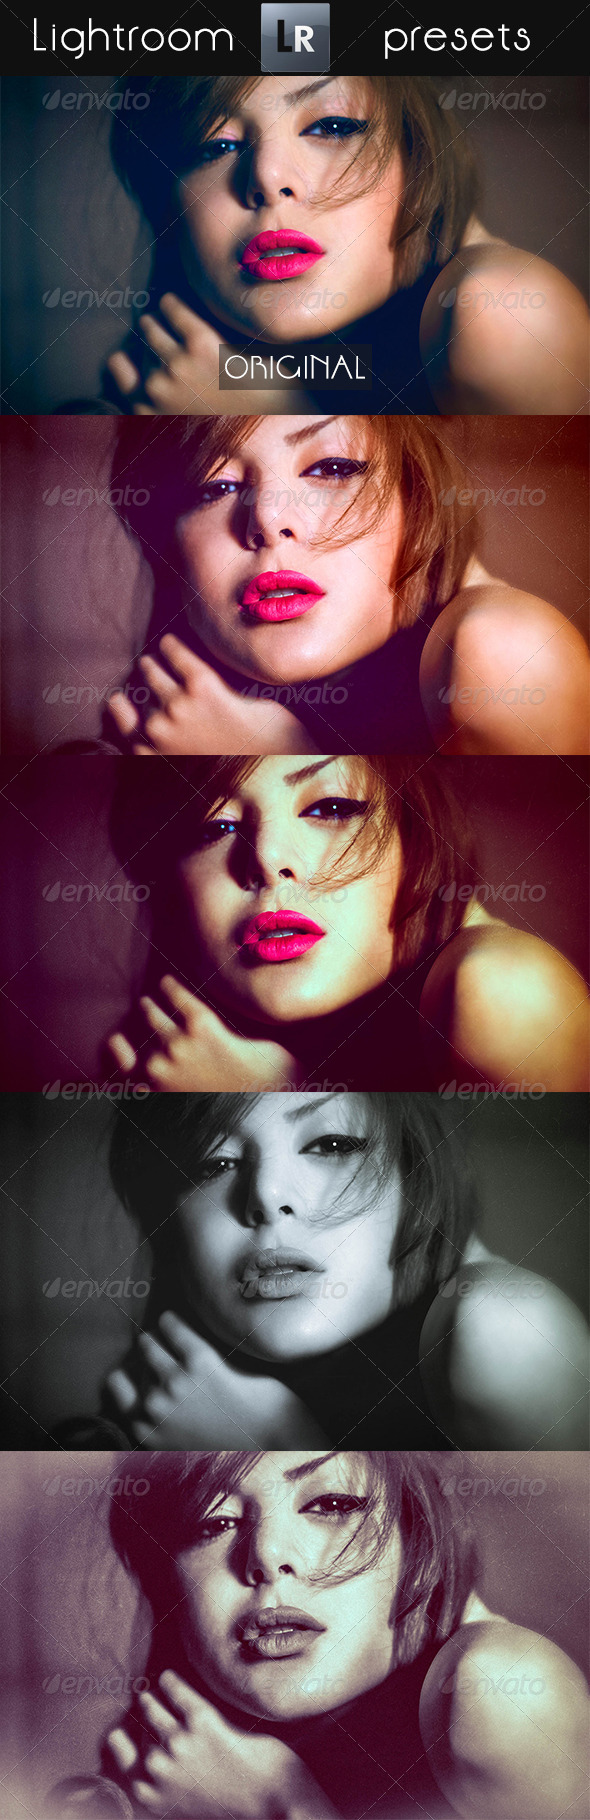 GraphicRiver 20 Portrait Pro Presets 5352120